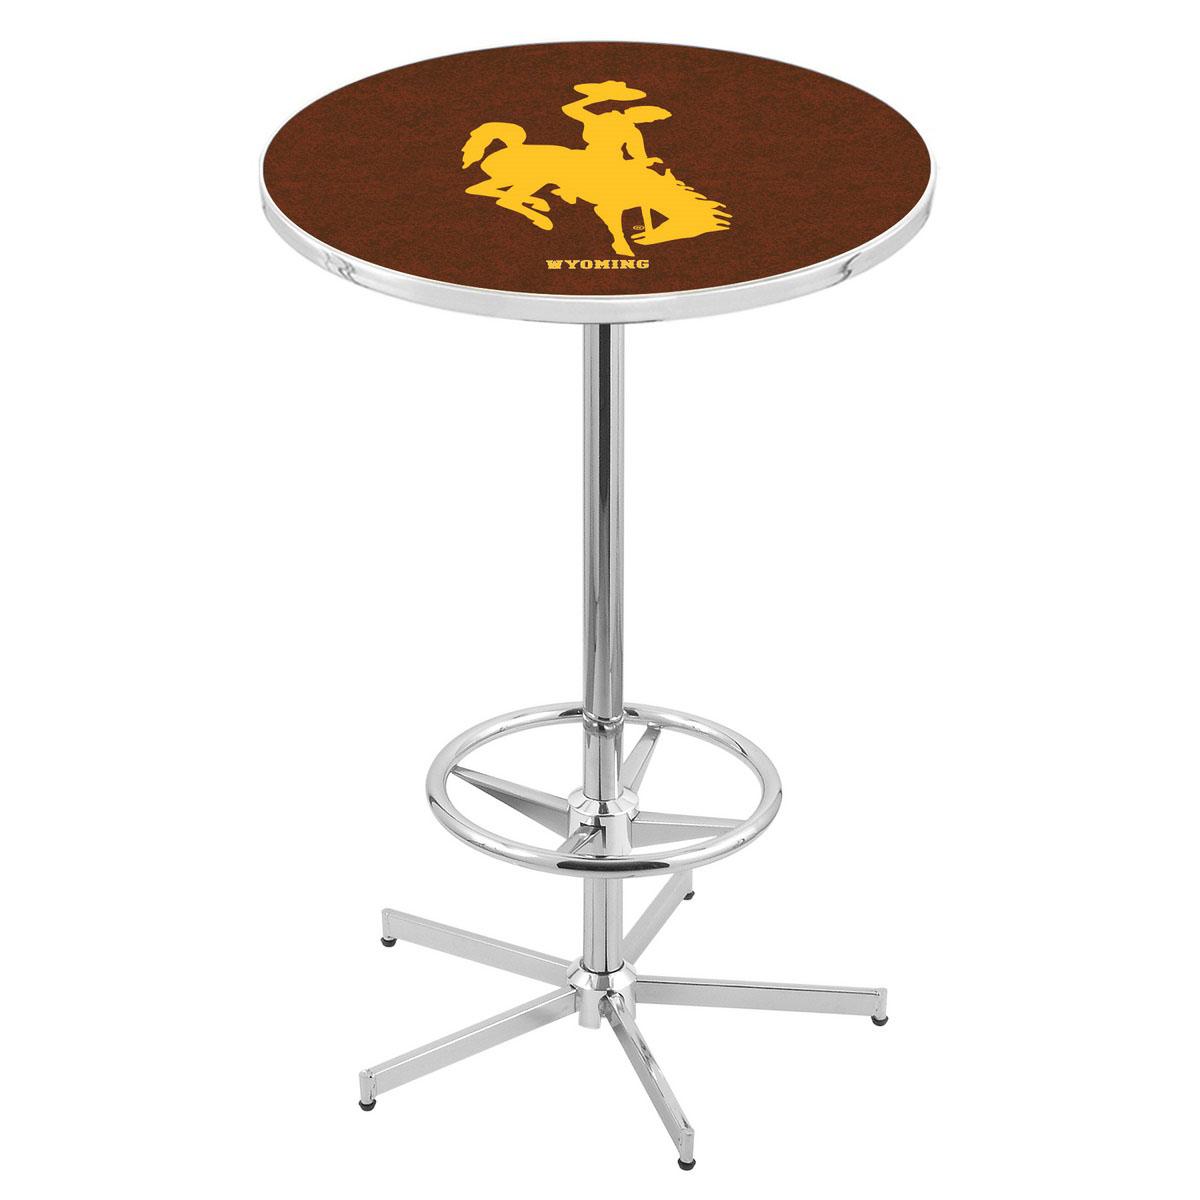 Superb-quality Chrome Wyoming Pub Table Product Photo